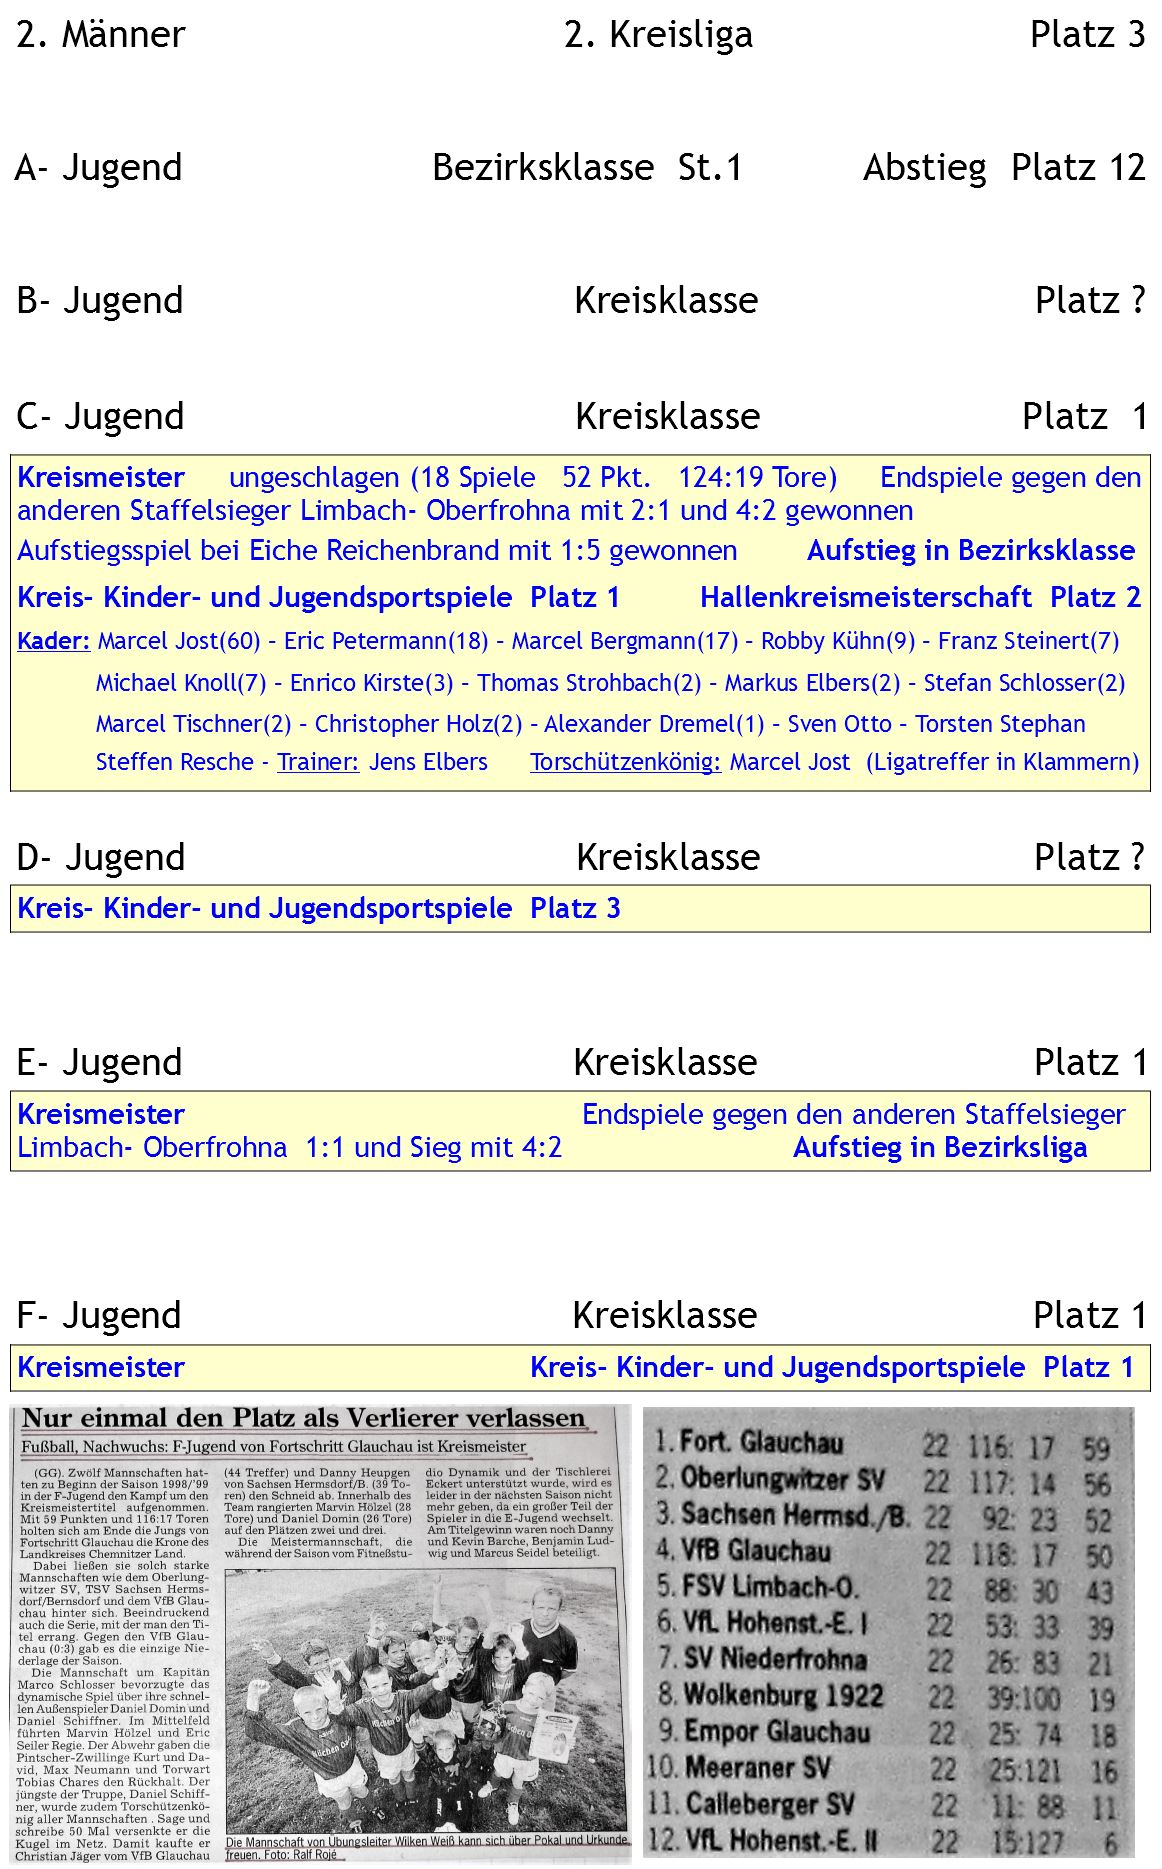 1998-99 Archiv 2